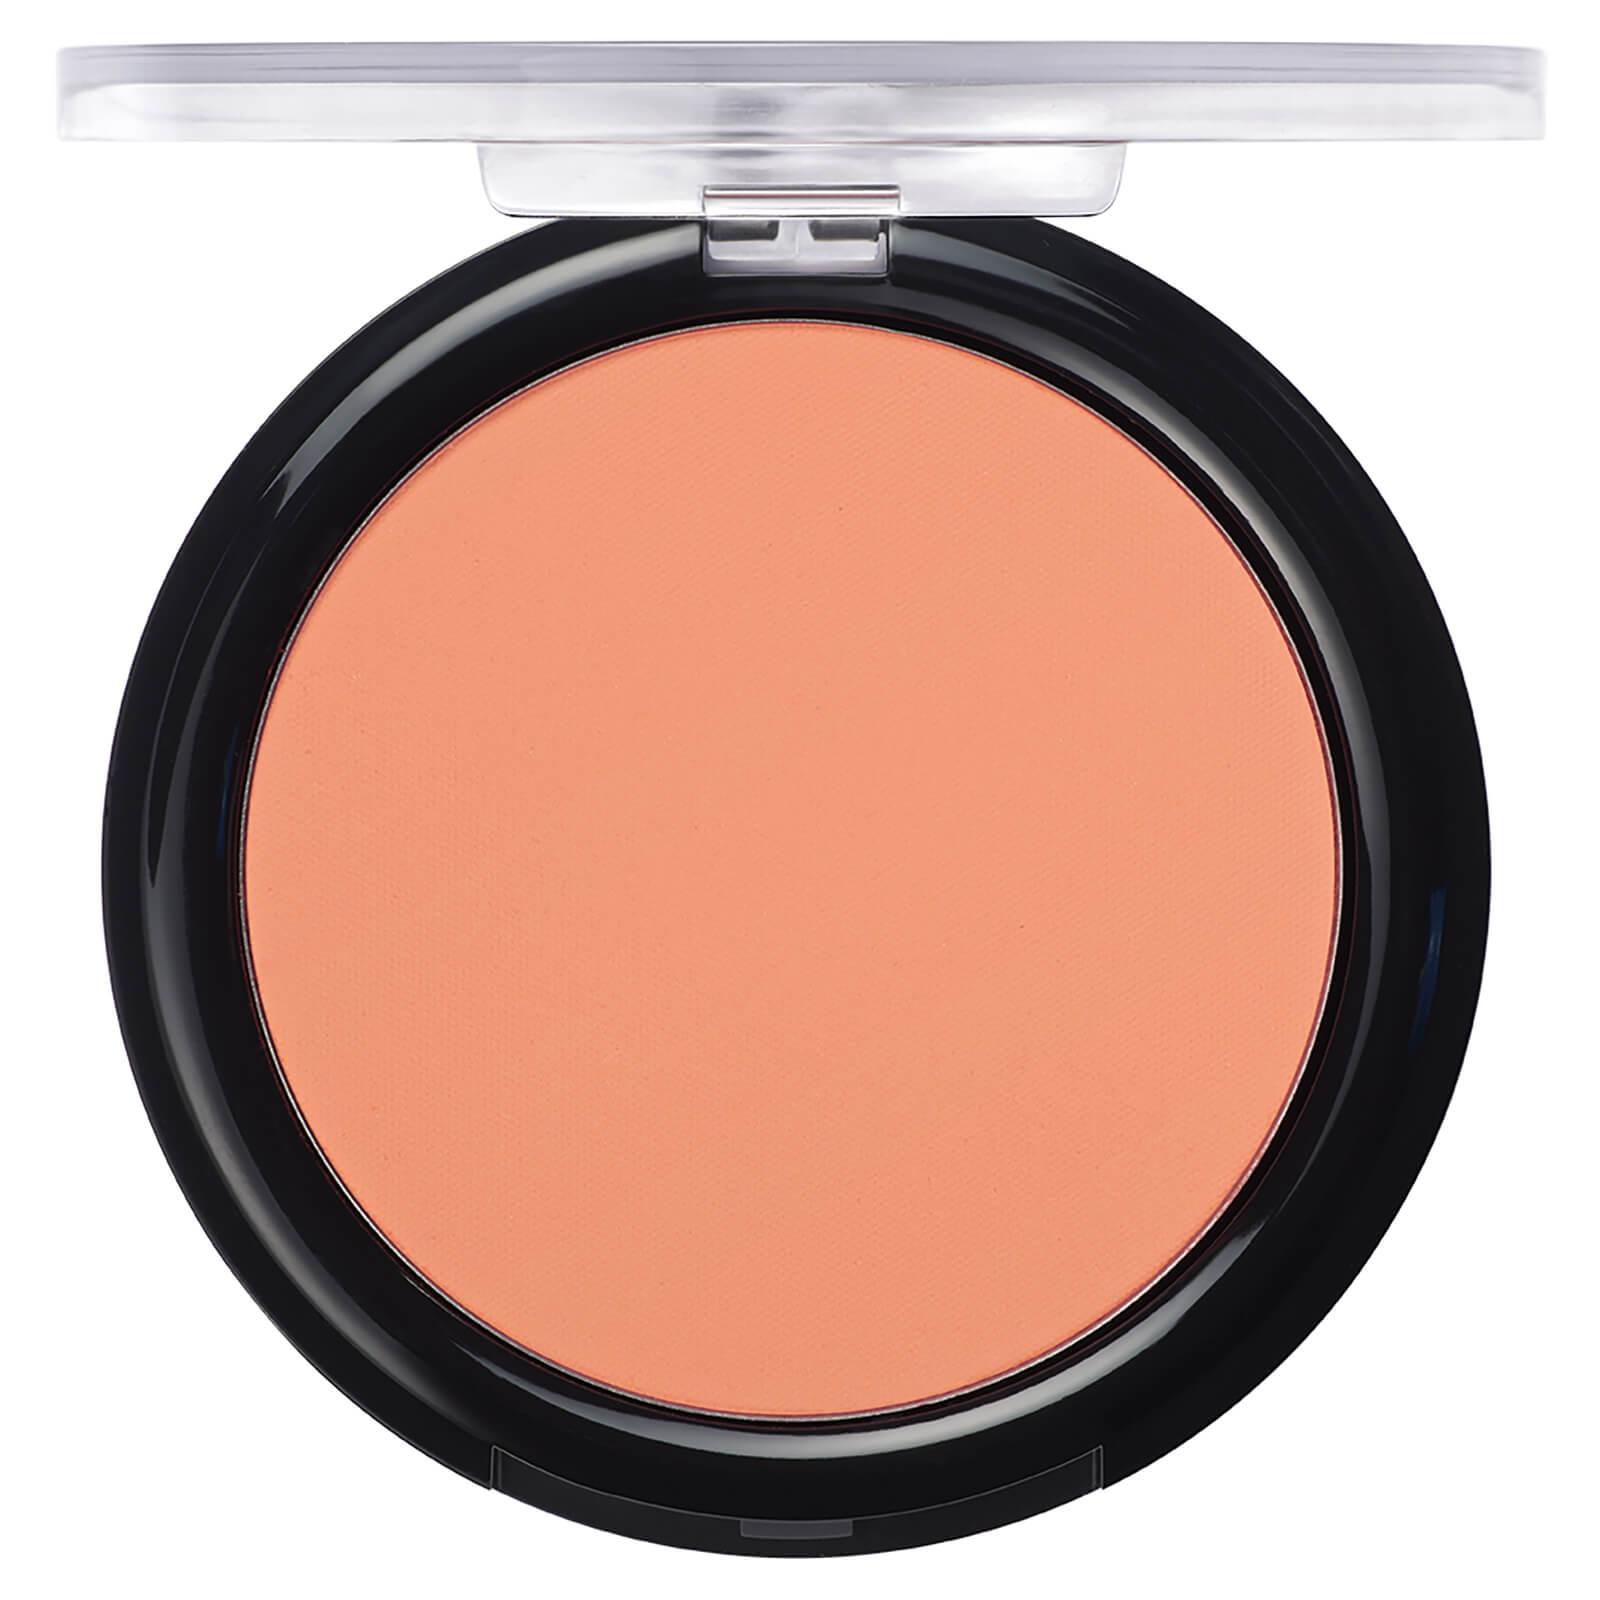 rimmel maxi blusher (various shades) - sweet cheeks